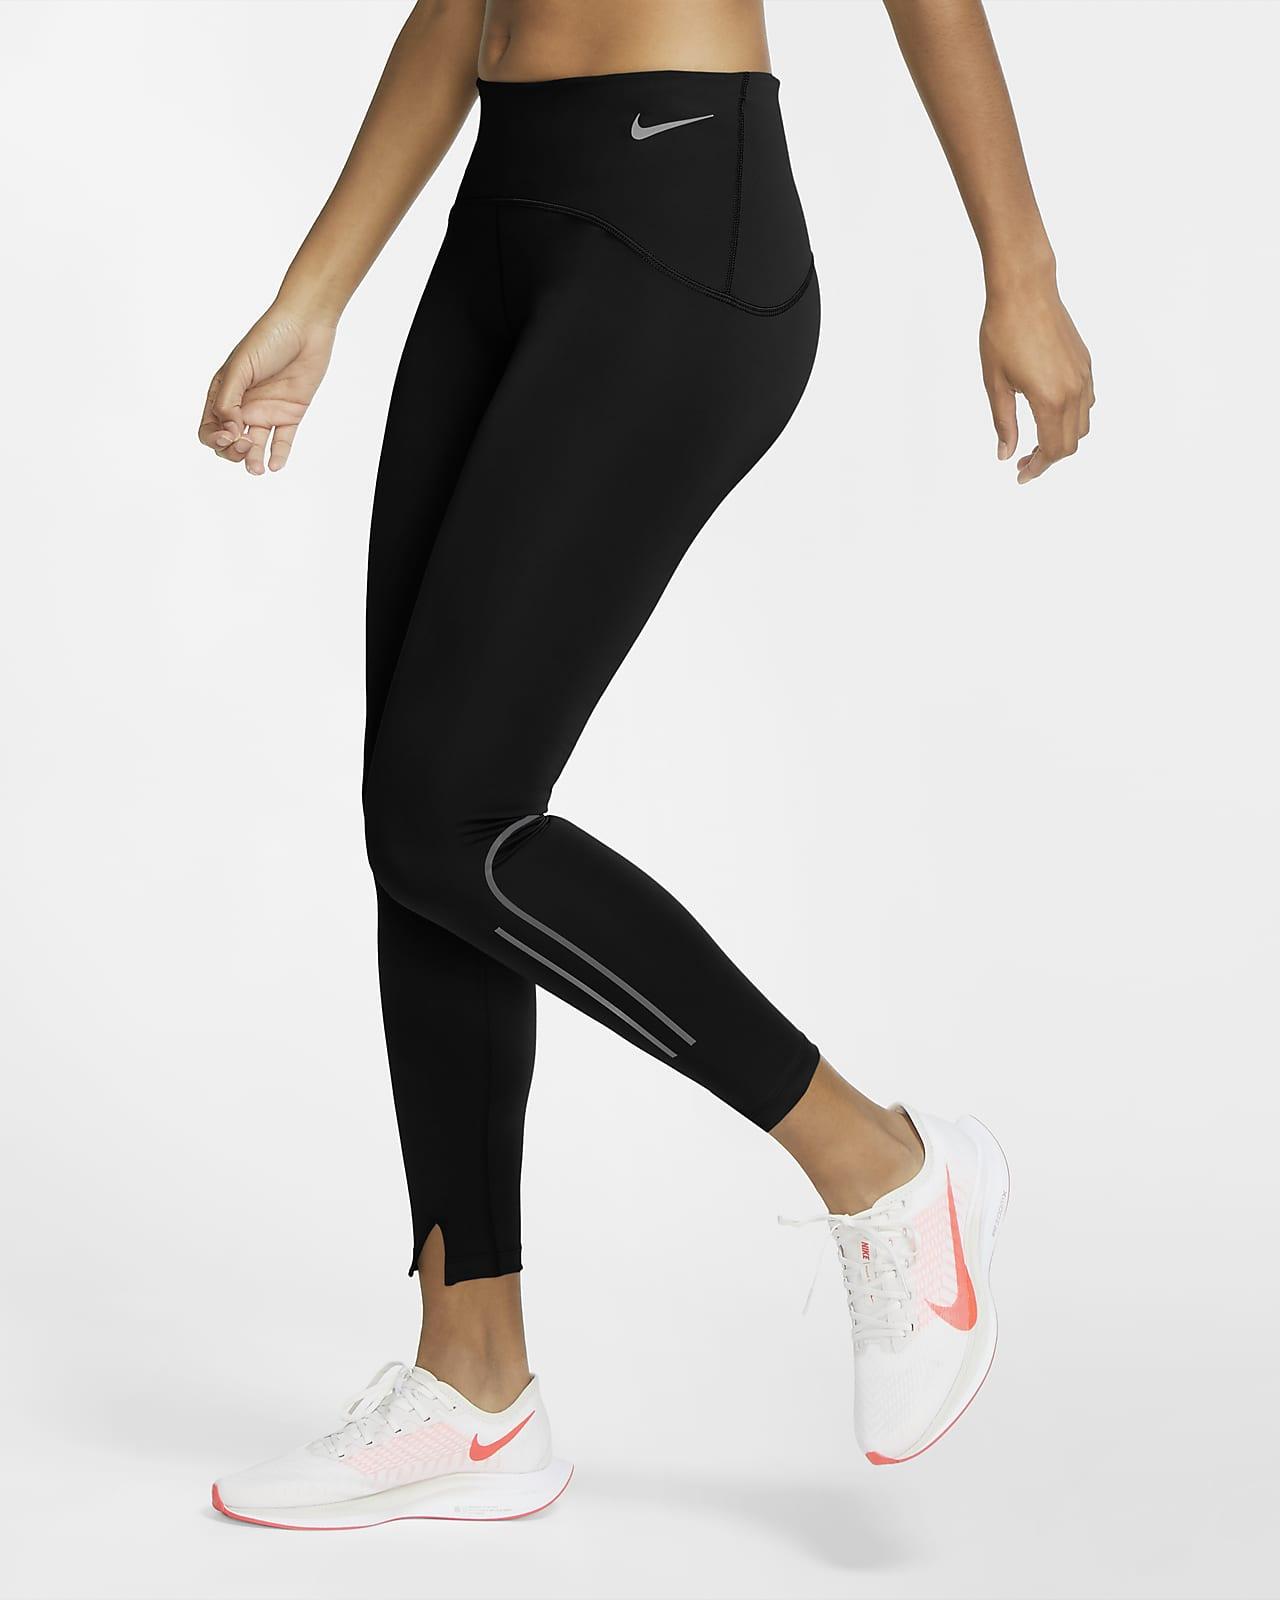 Nike Speed Mallas De Running De 7 8 Mate Mujer Nike Es